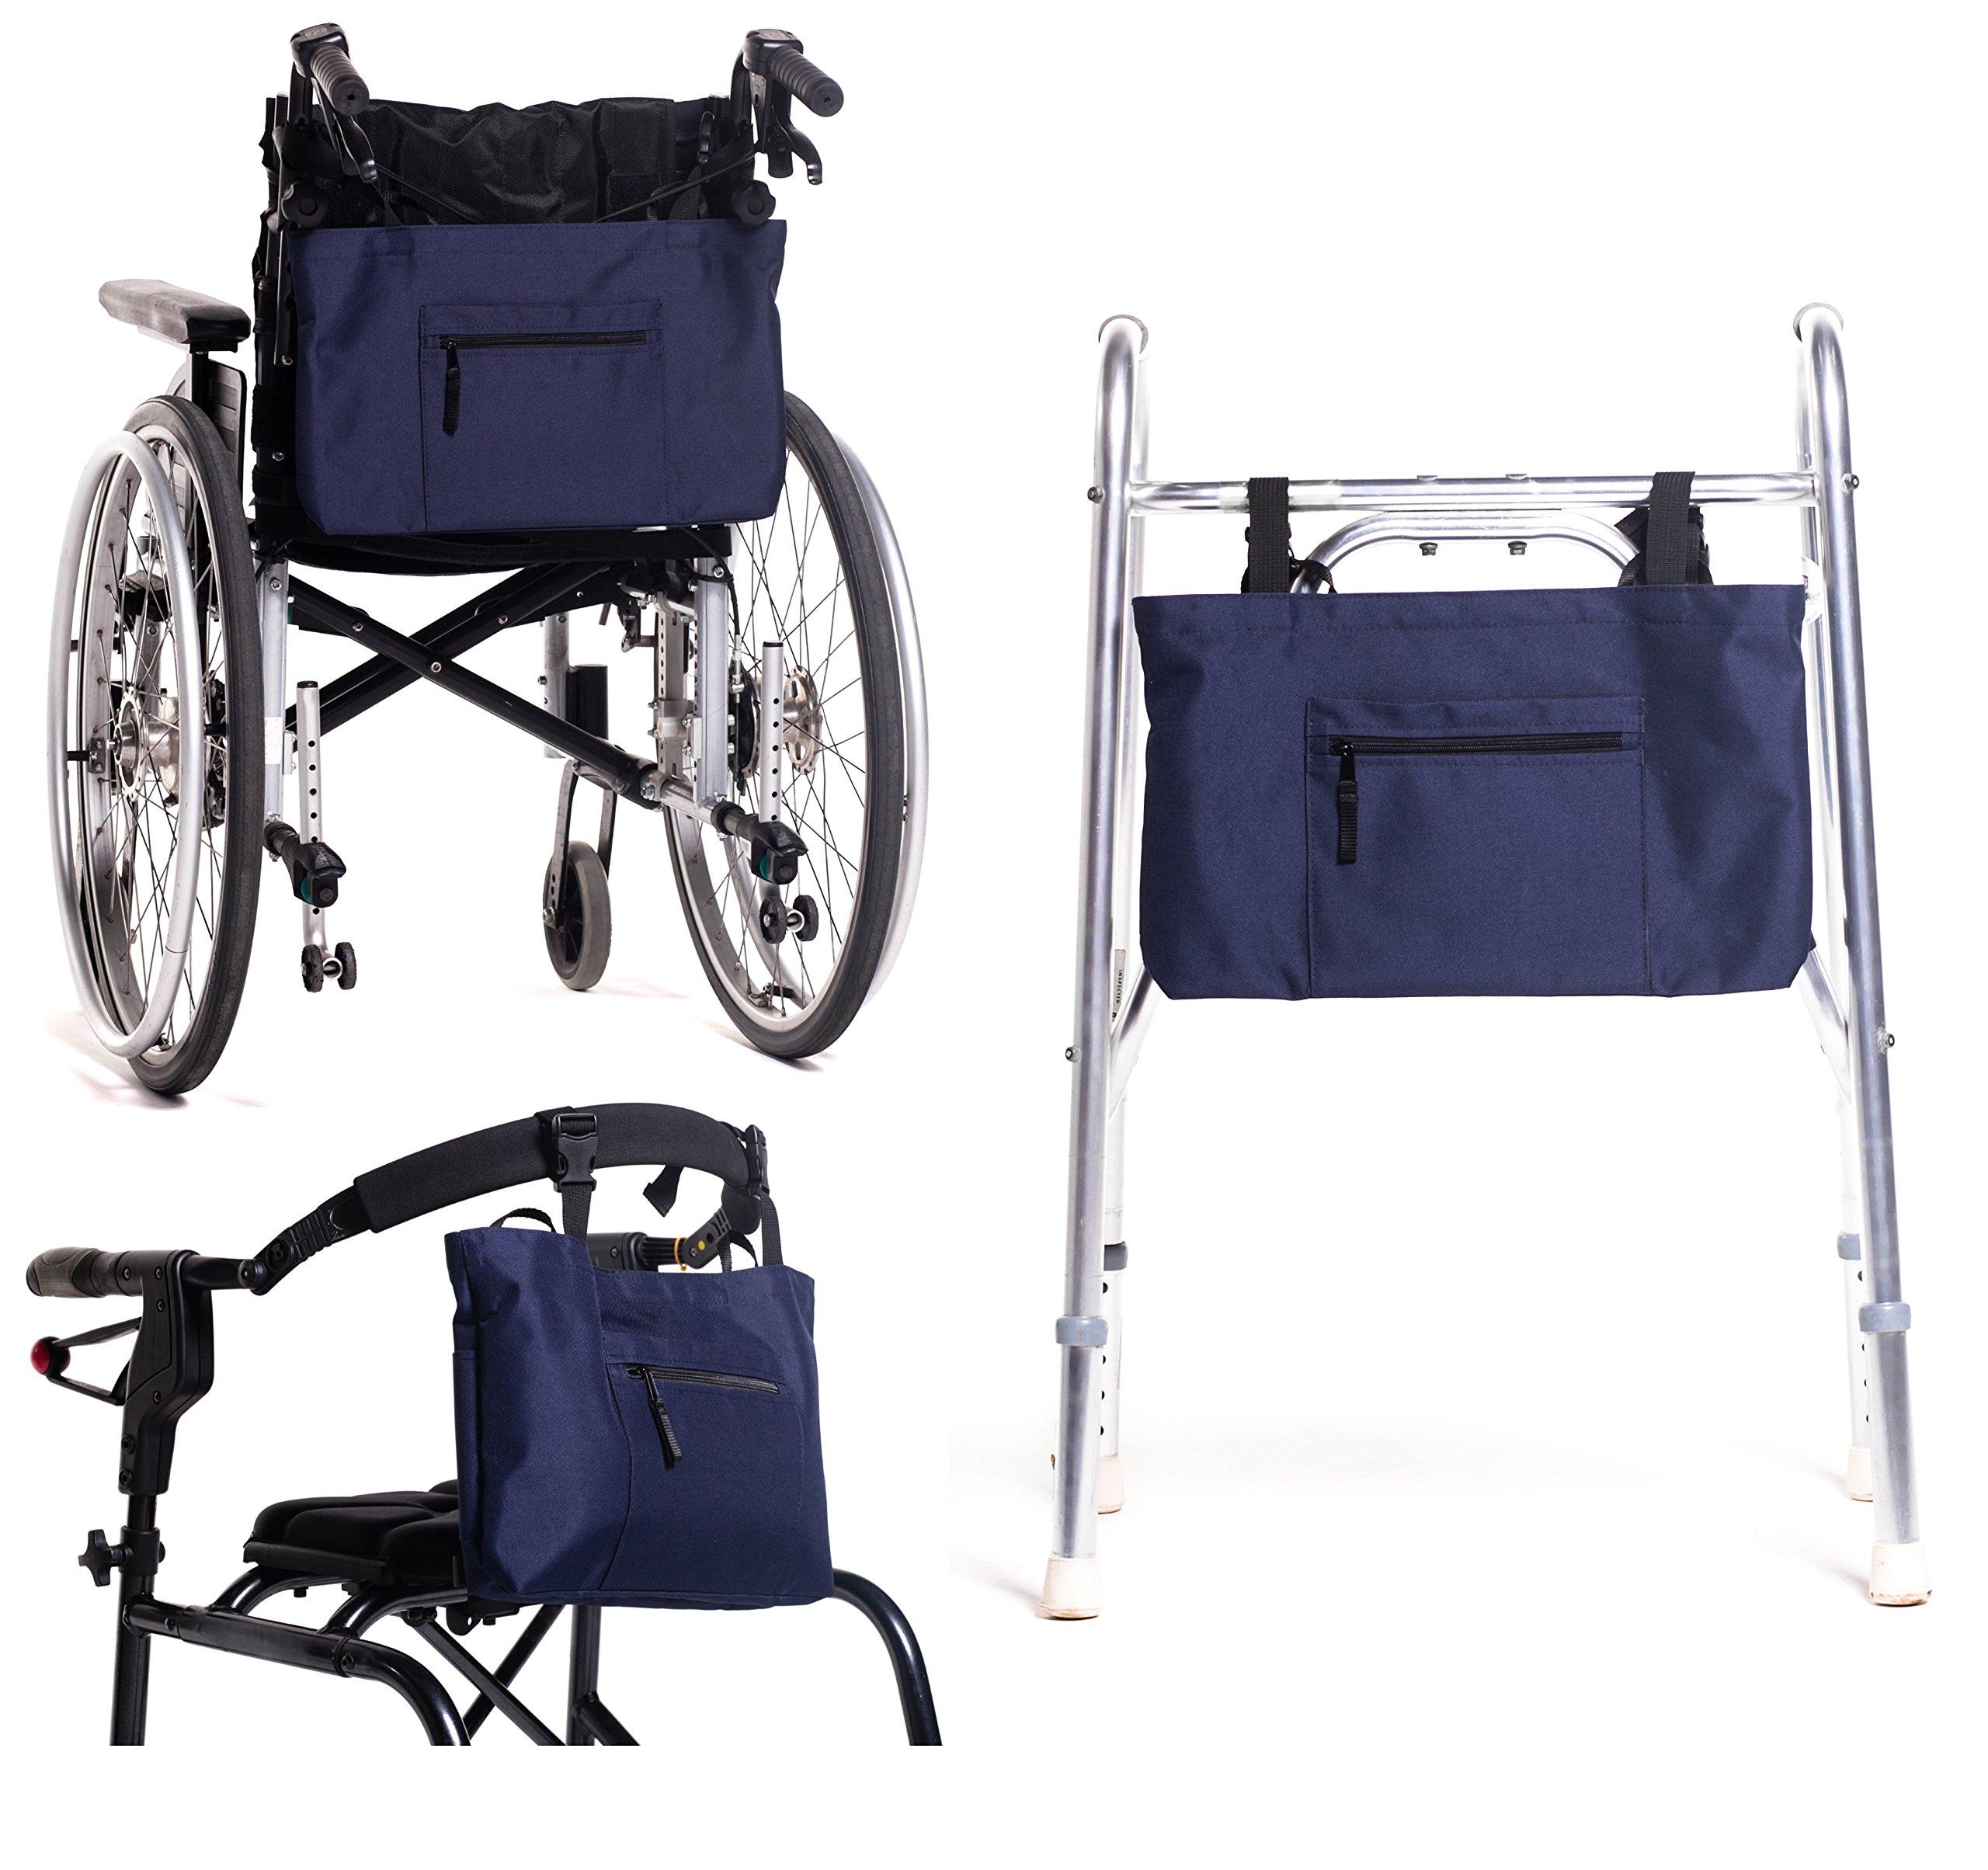 Walker Bag - Walker Tote Bag - Water-Resistant Walker Pouch - Universal Fit for Walkers, Scooters Or Rollator Walkers